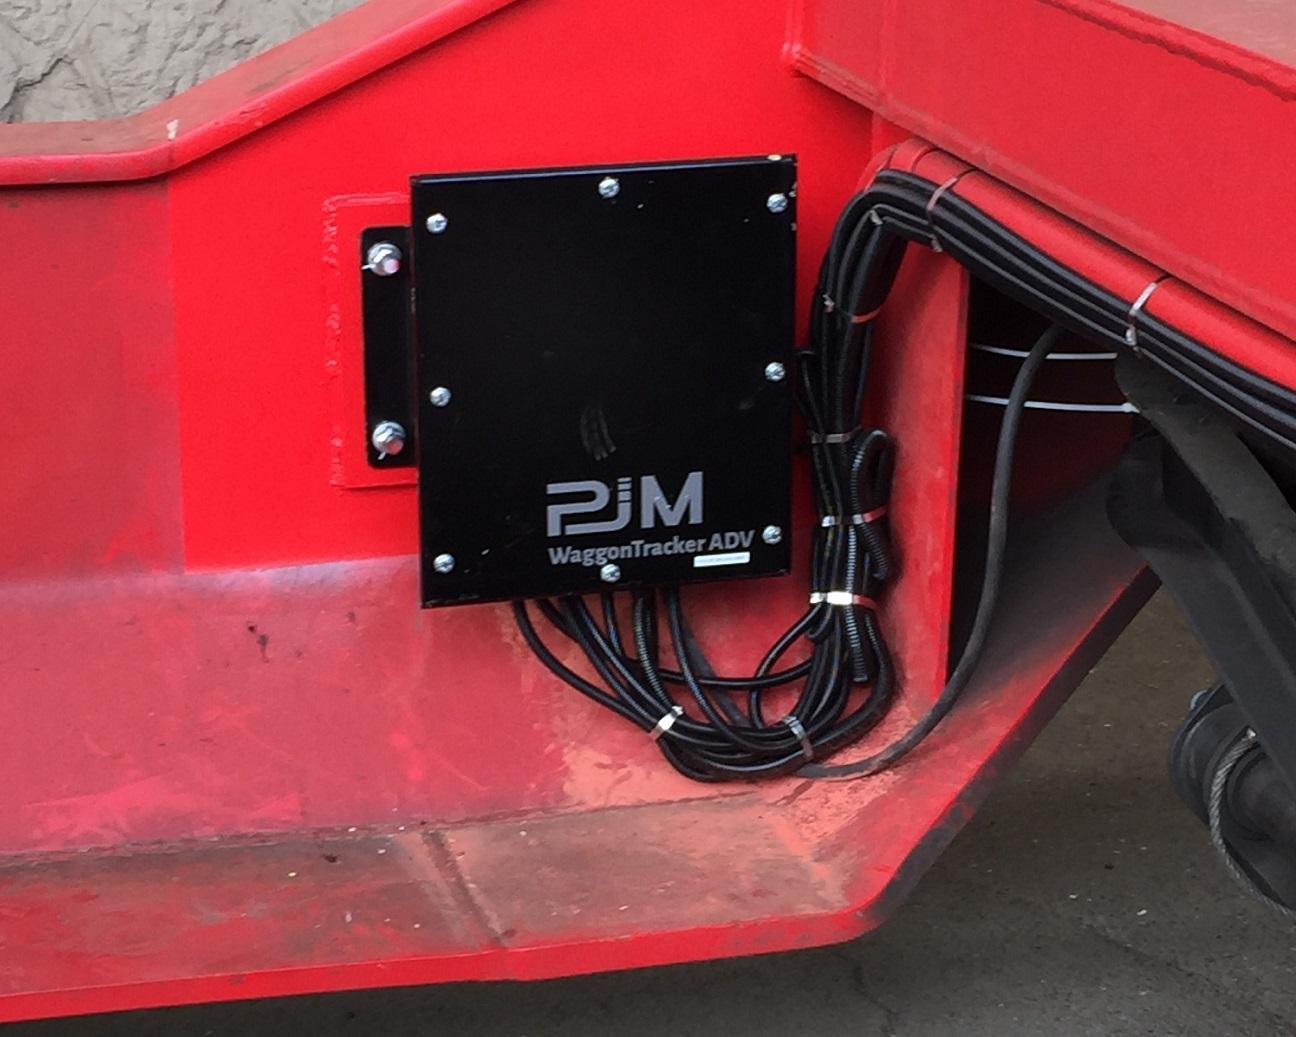 PJM_Autonom_Messystem_Box_Web